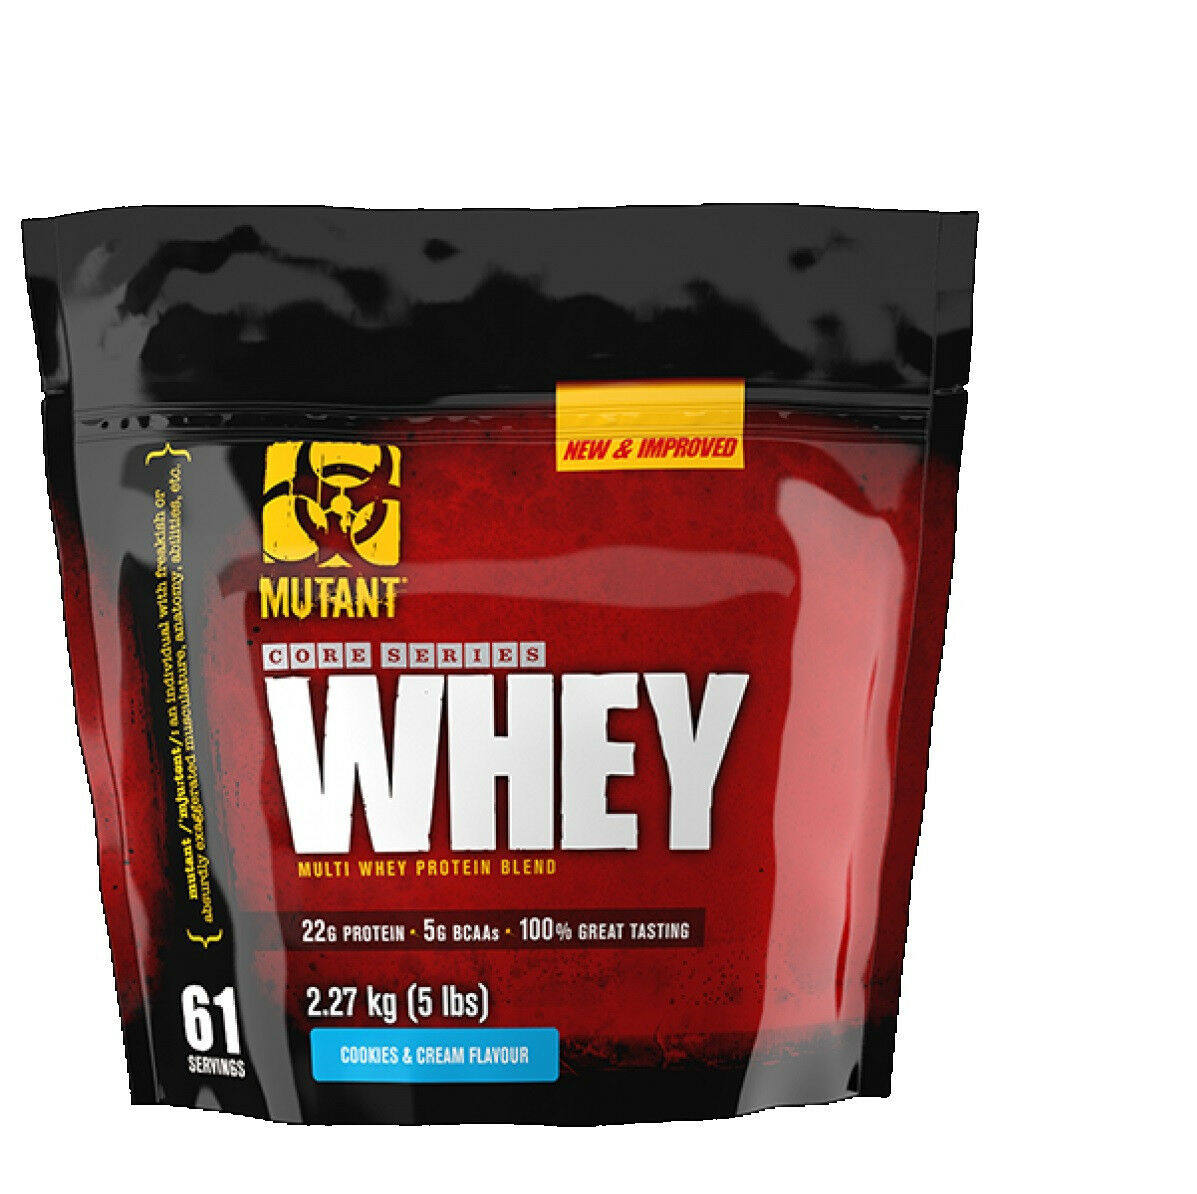 PVL Mutant Whey Protein Powder 2.27kg KG Multi Whey Protein Blend Cookies &